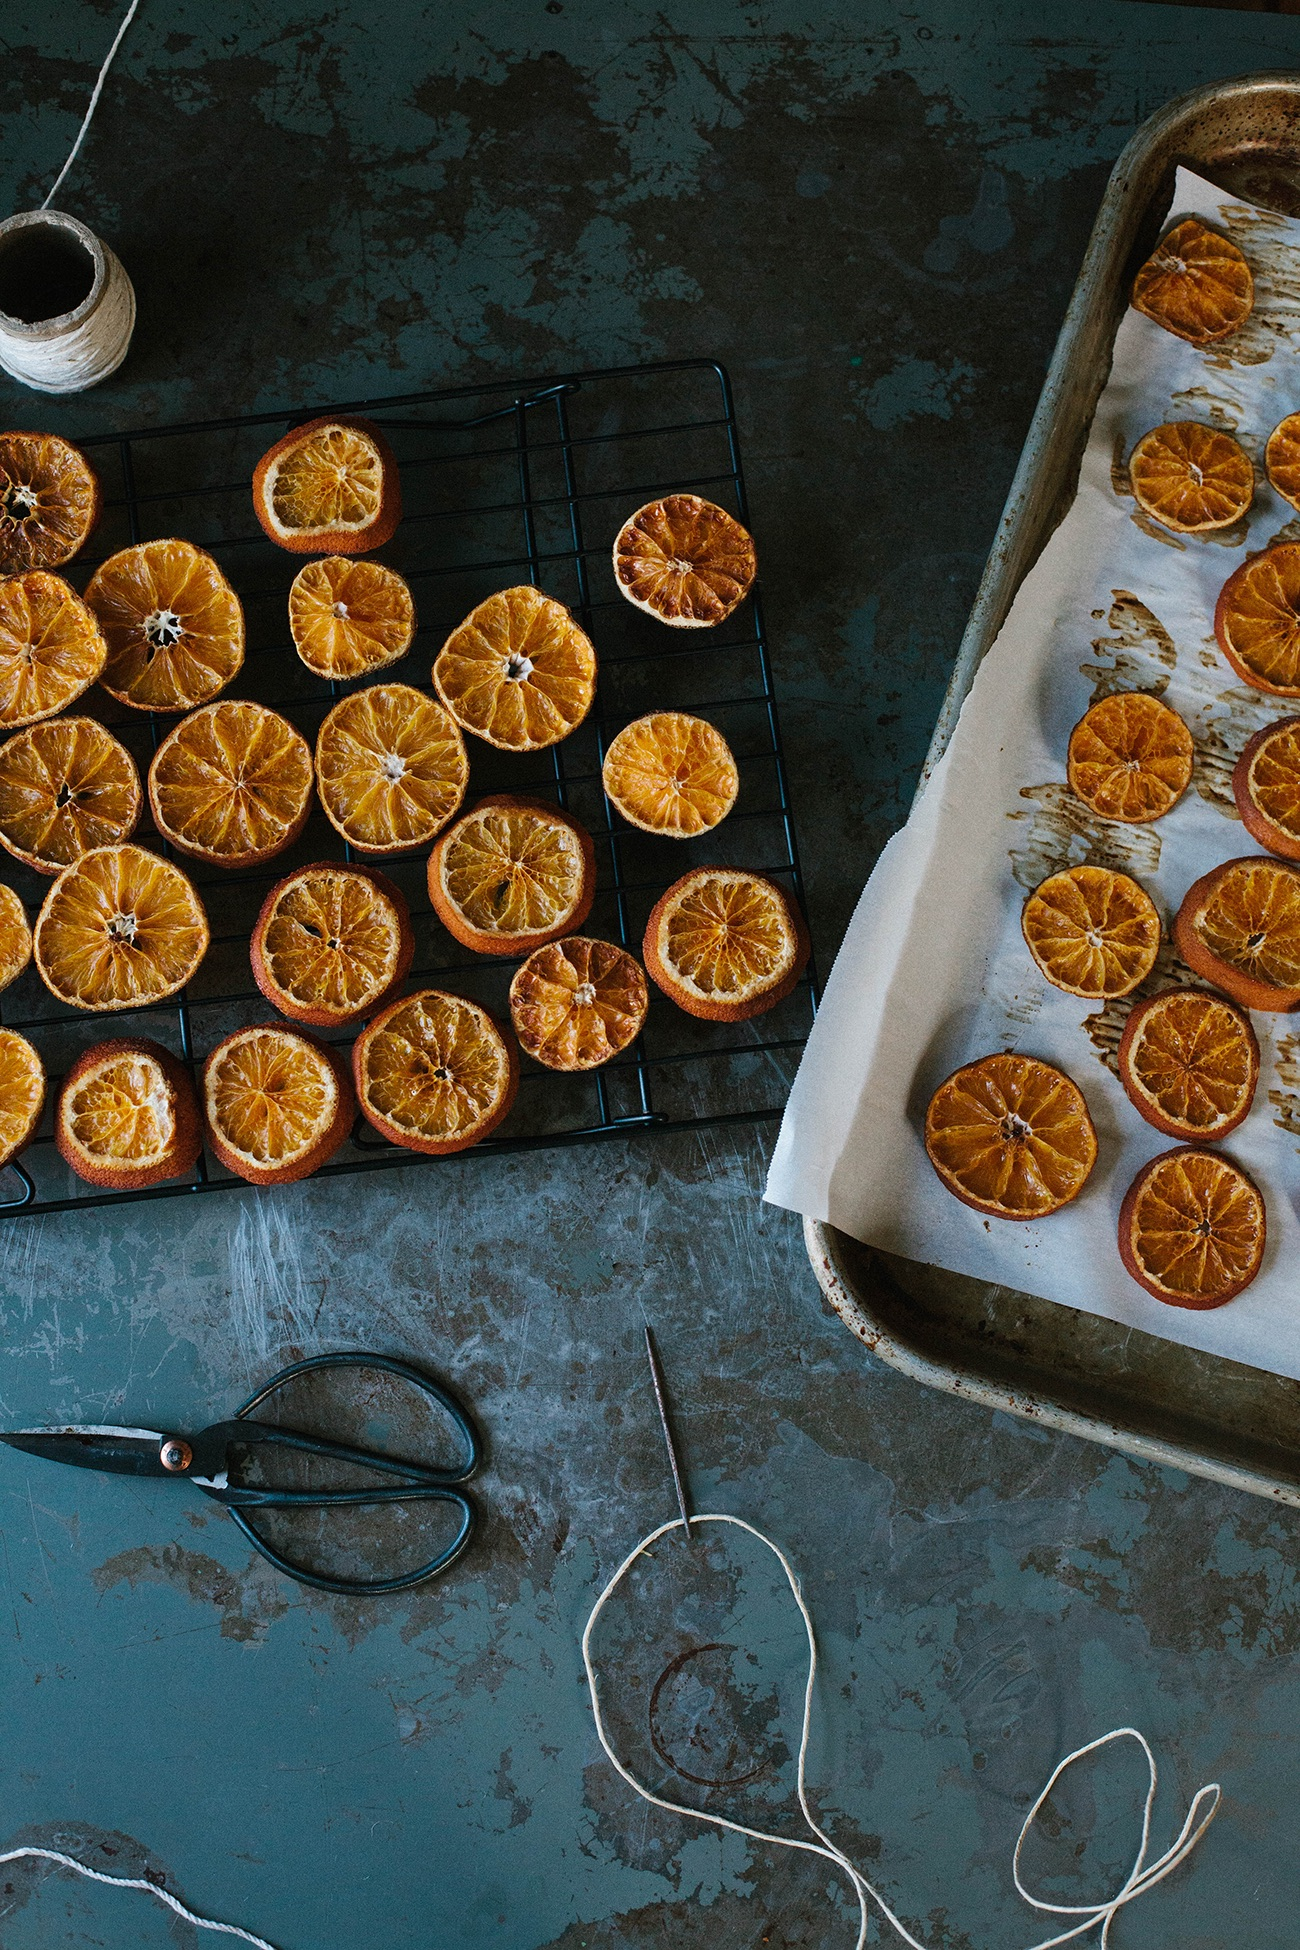 DIY orange garland by A Daily Something